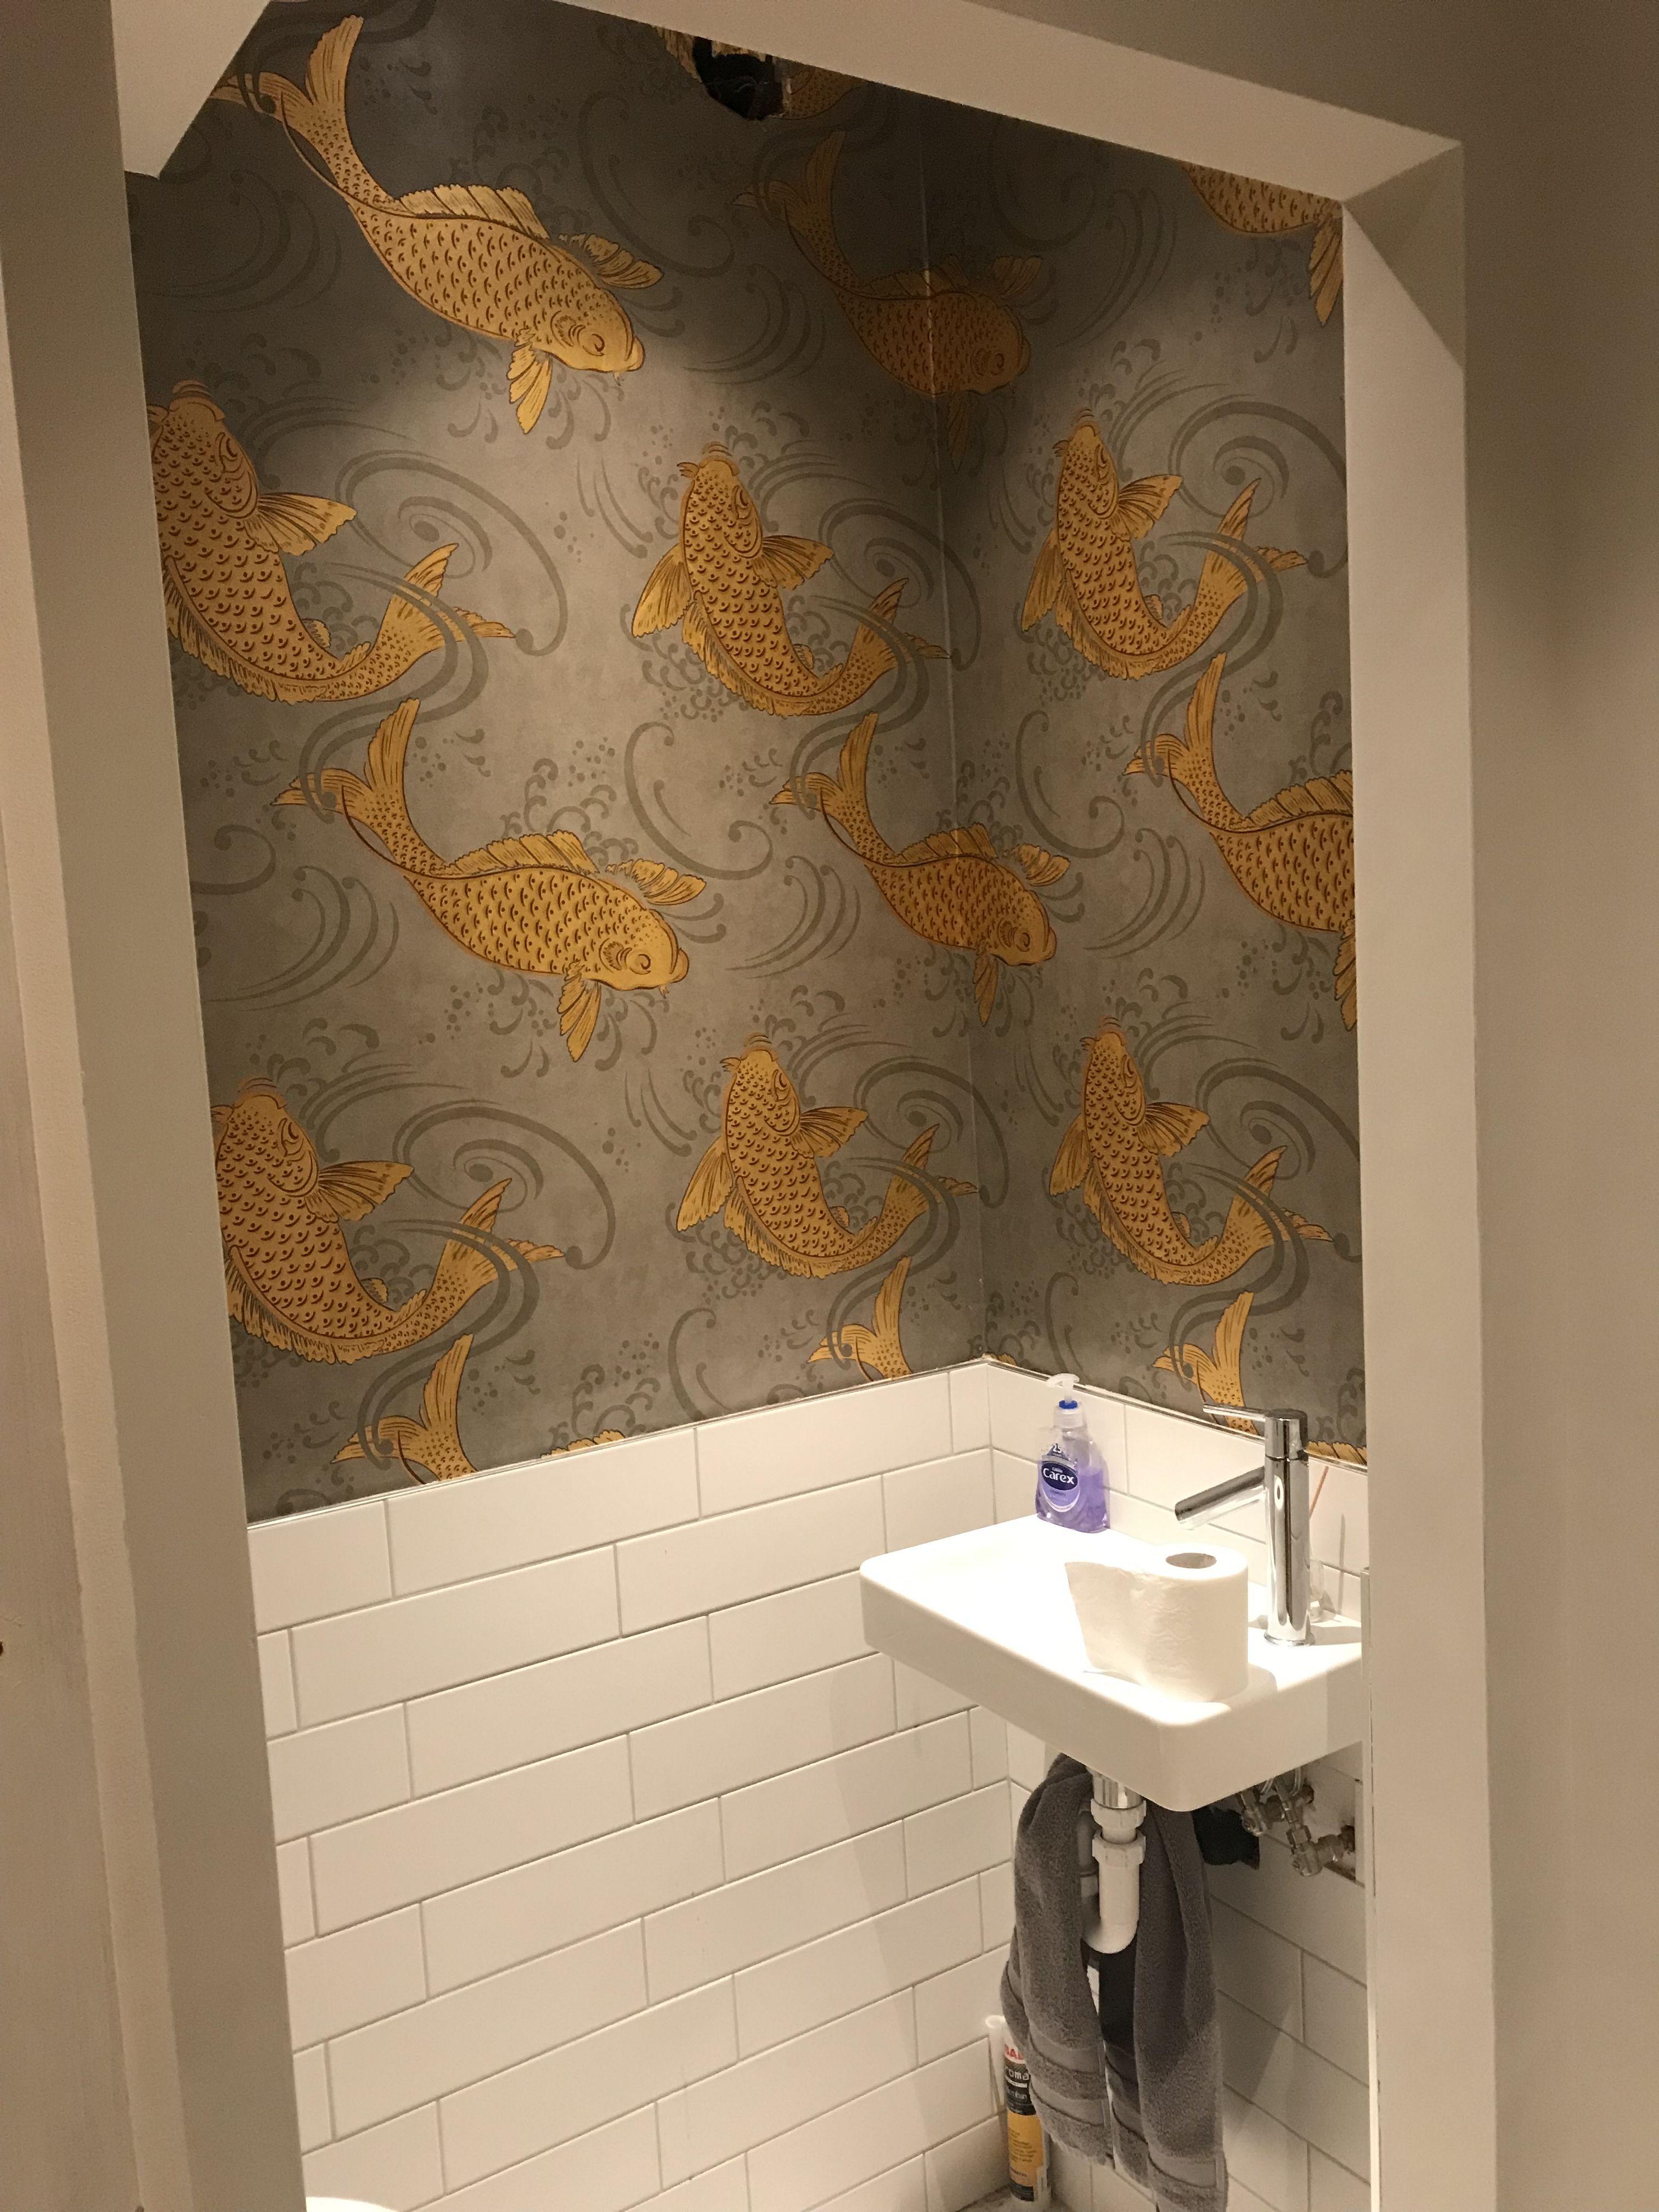 Koi Carp Wallpaper Toilet Room Decor Bathroom Wallpaper Fish Bathroom Wallpaper